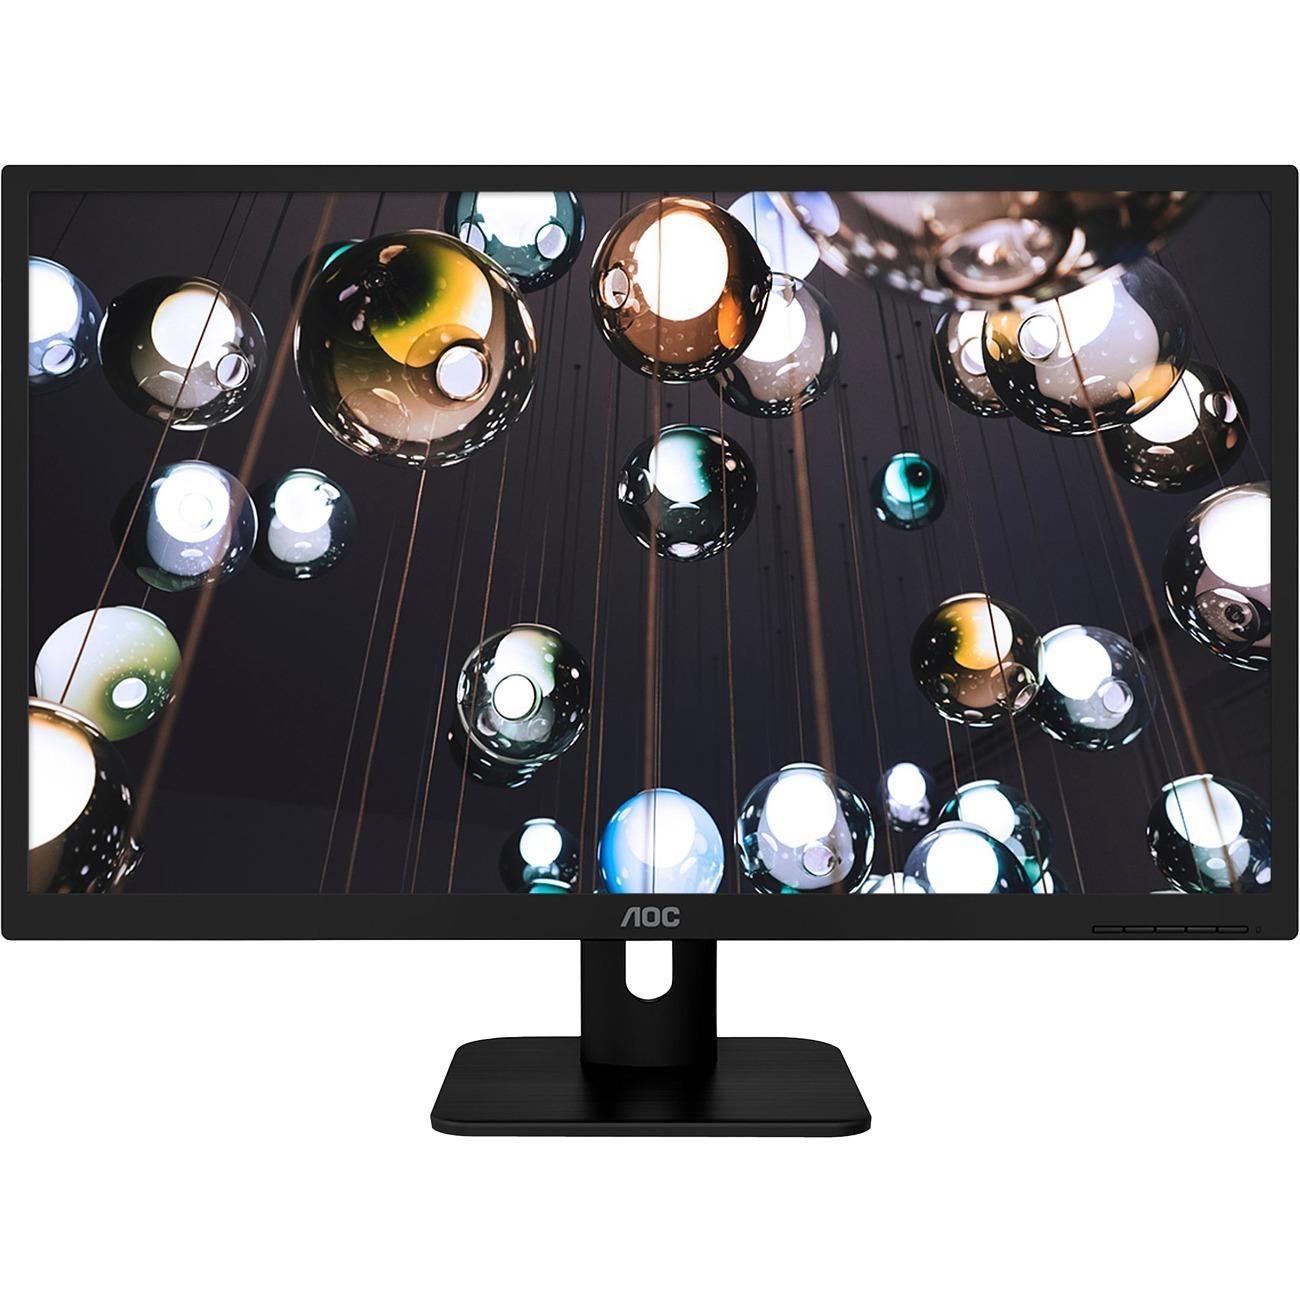 AOC 27E1H 27inch IPS LED LCD Monitor - 16:9 - 5 ms